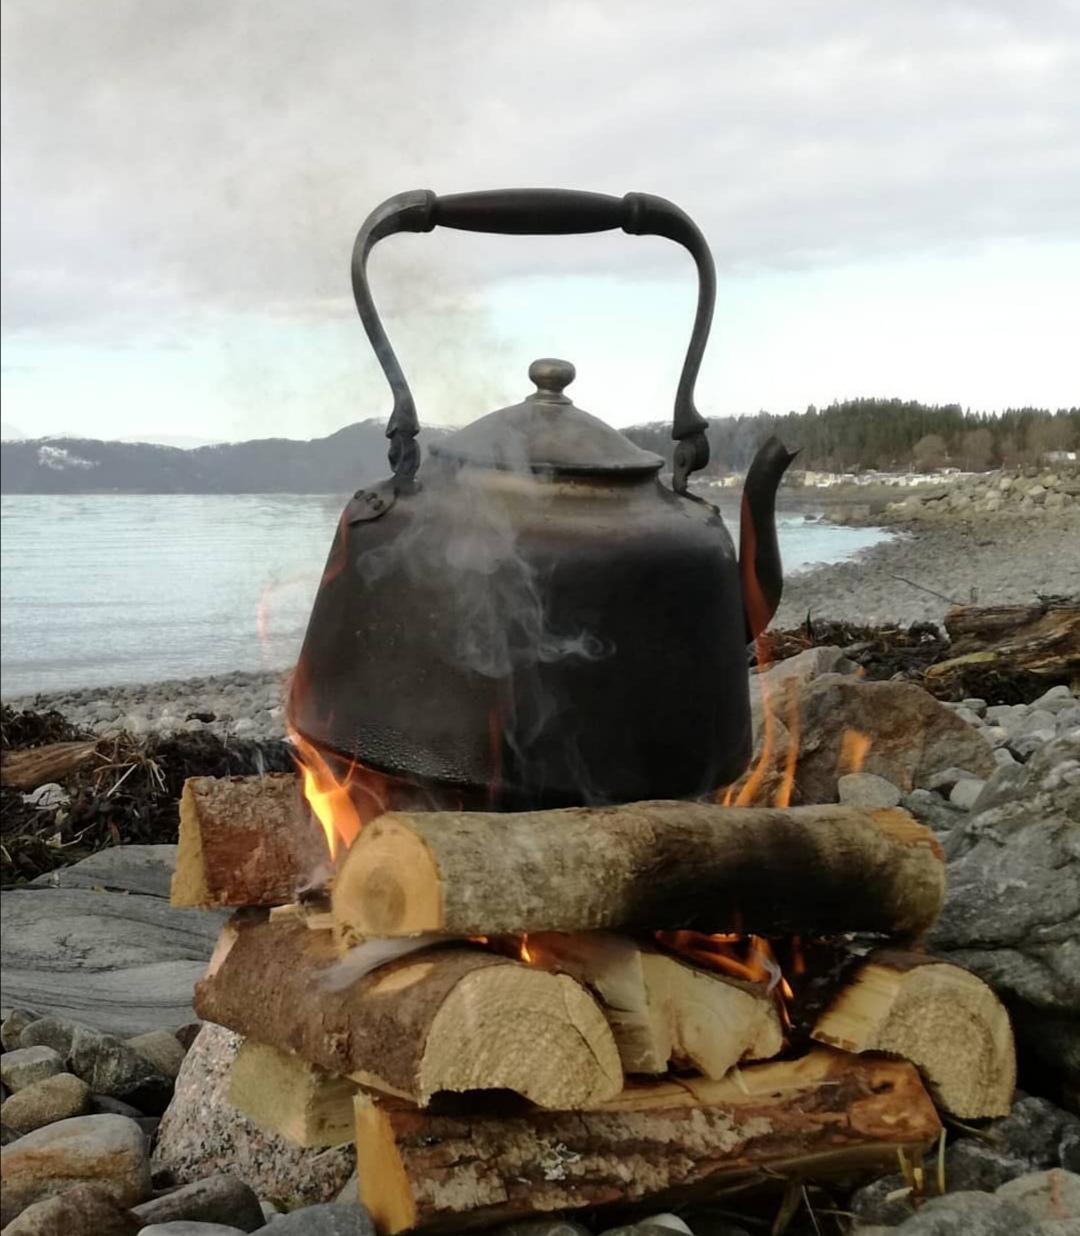 Teekessel auf Feuer am Flussufer